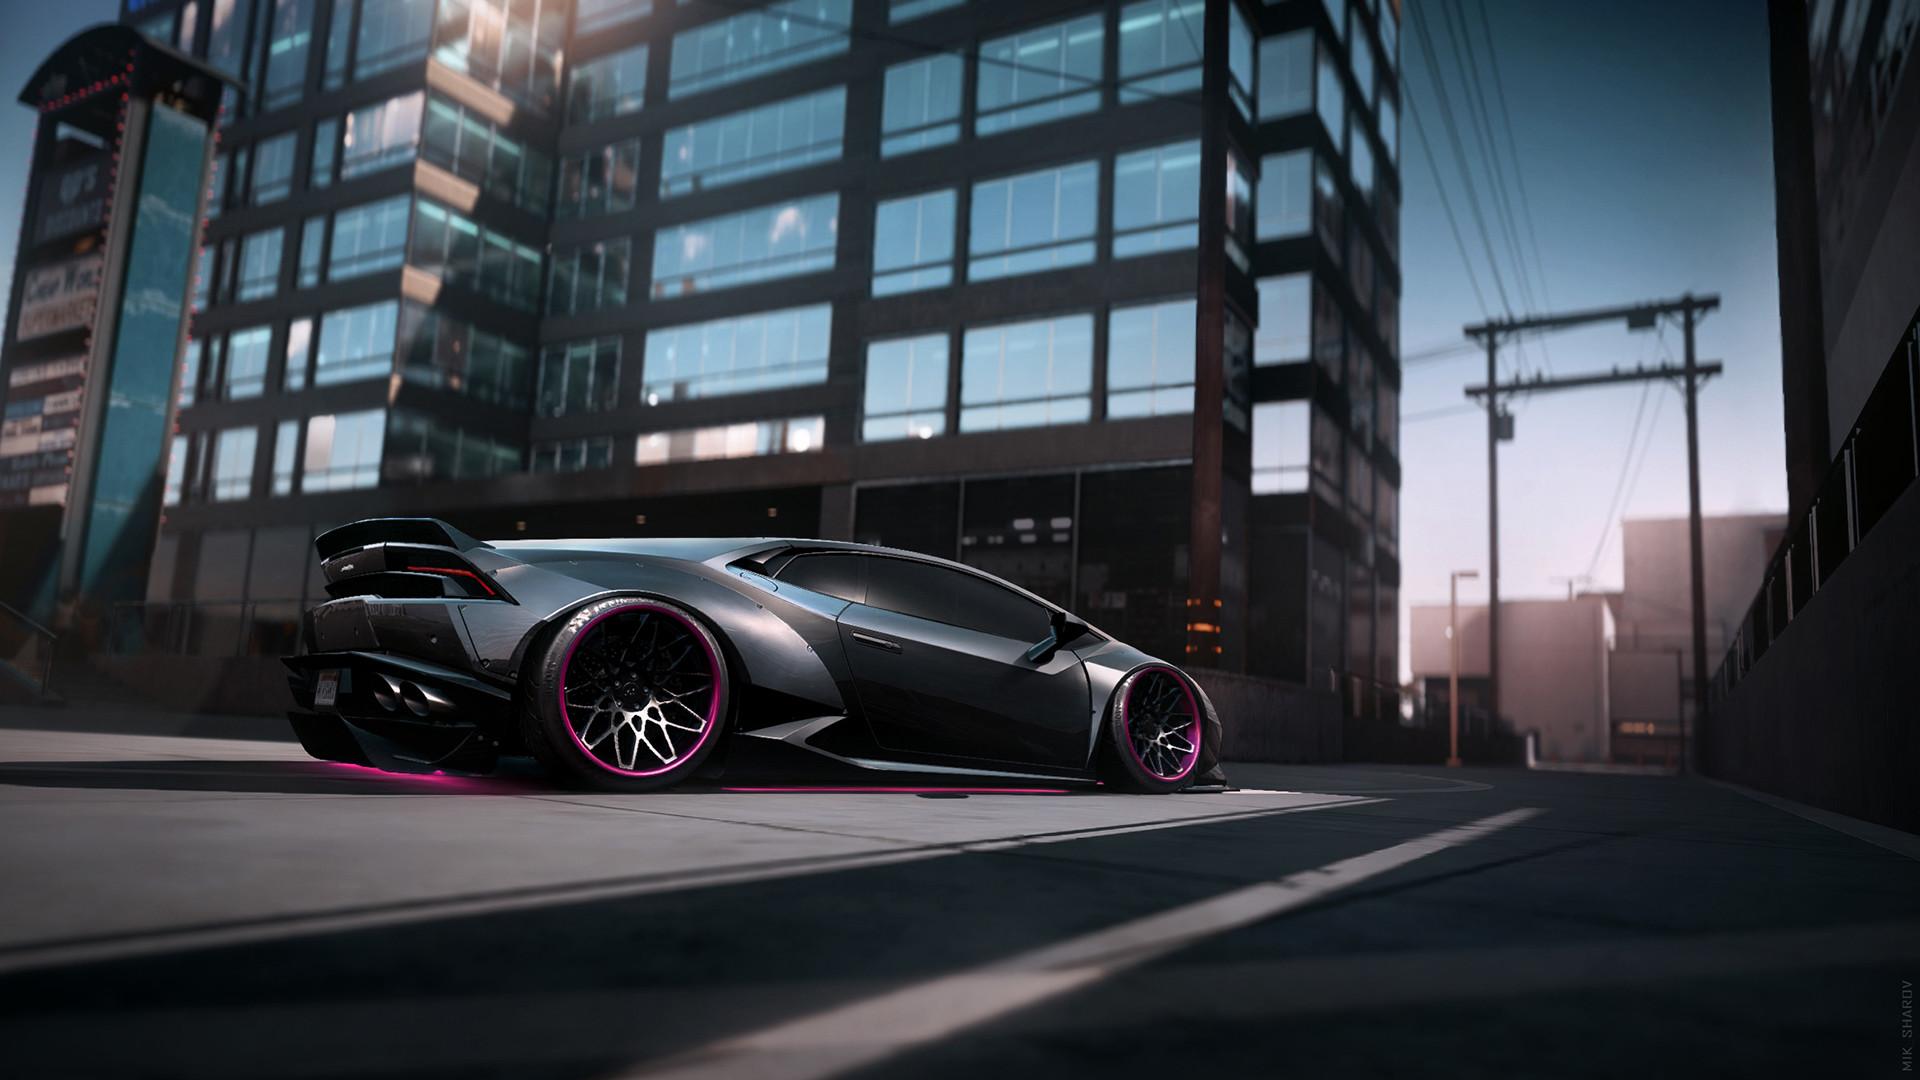 mikhail-sharov-1-1080-d Extraordinary Lamborghini Huracan Need for Speed Cars Trend